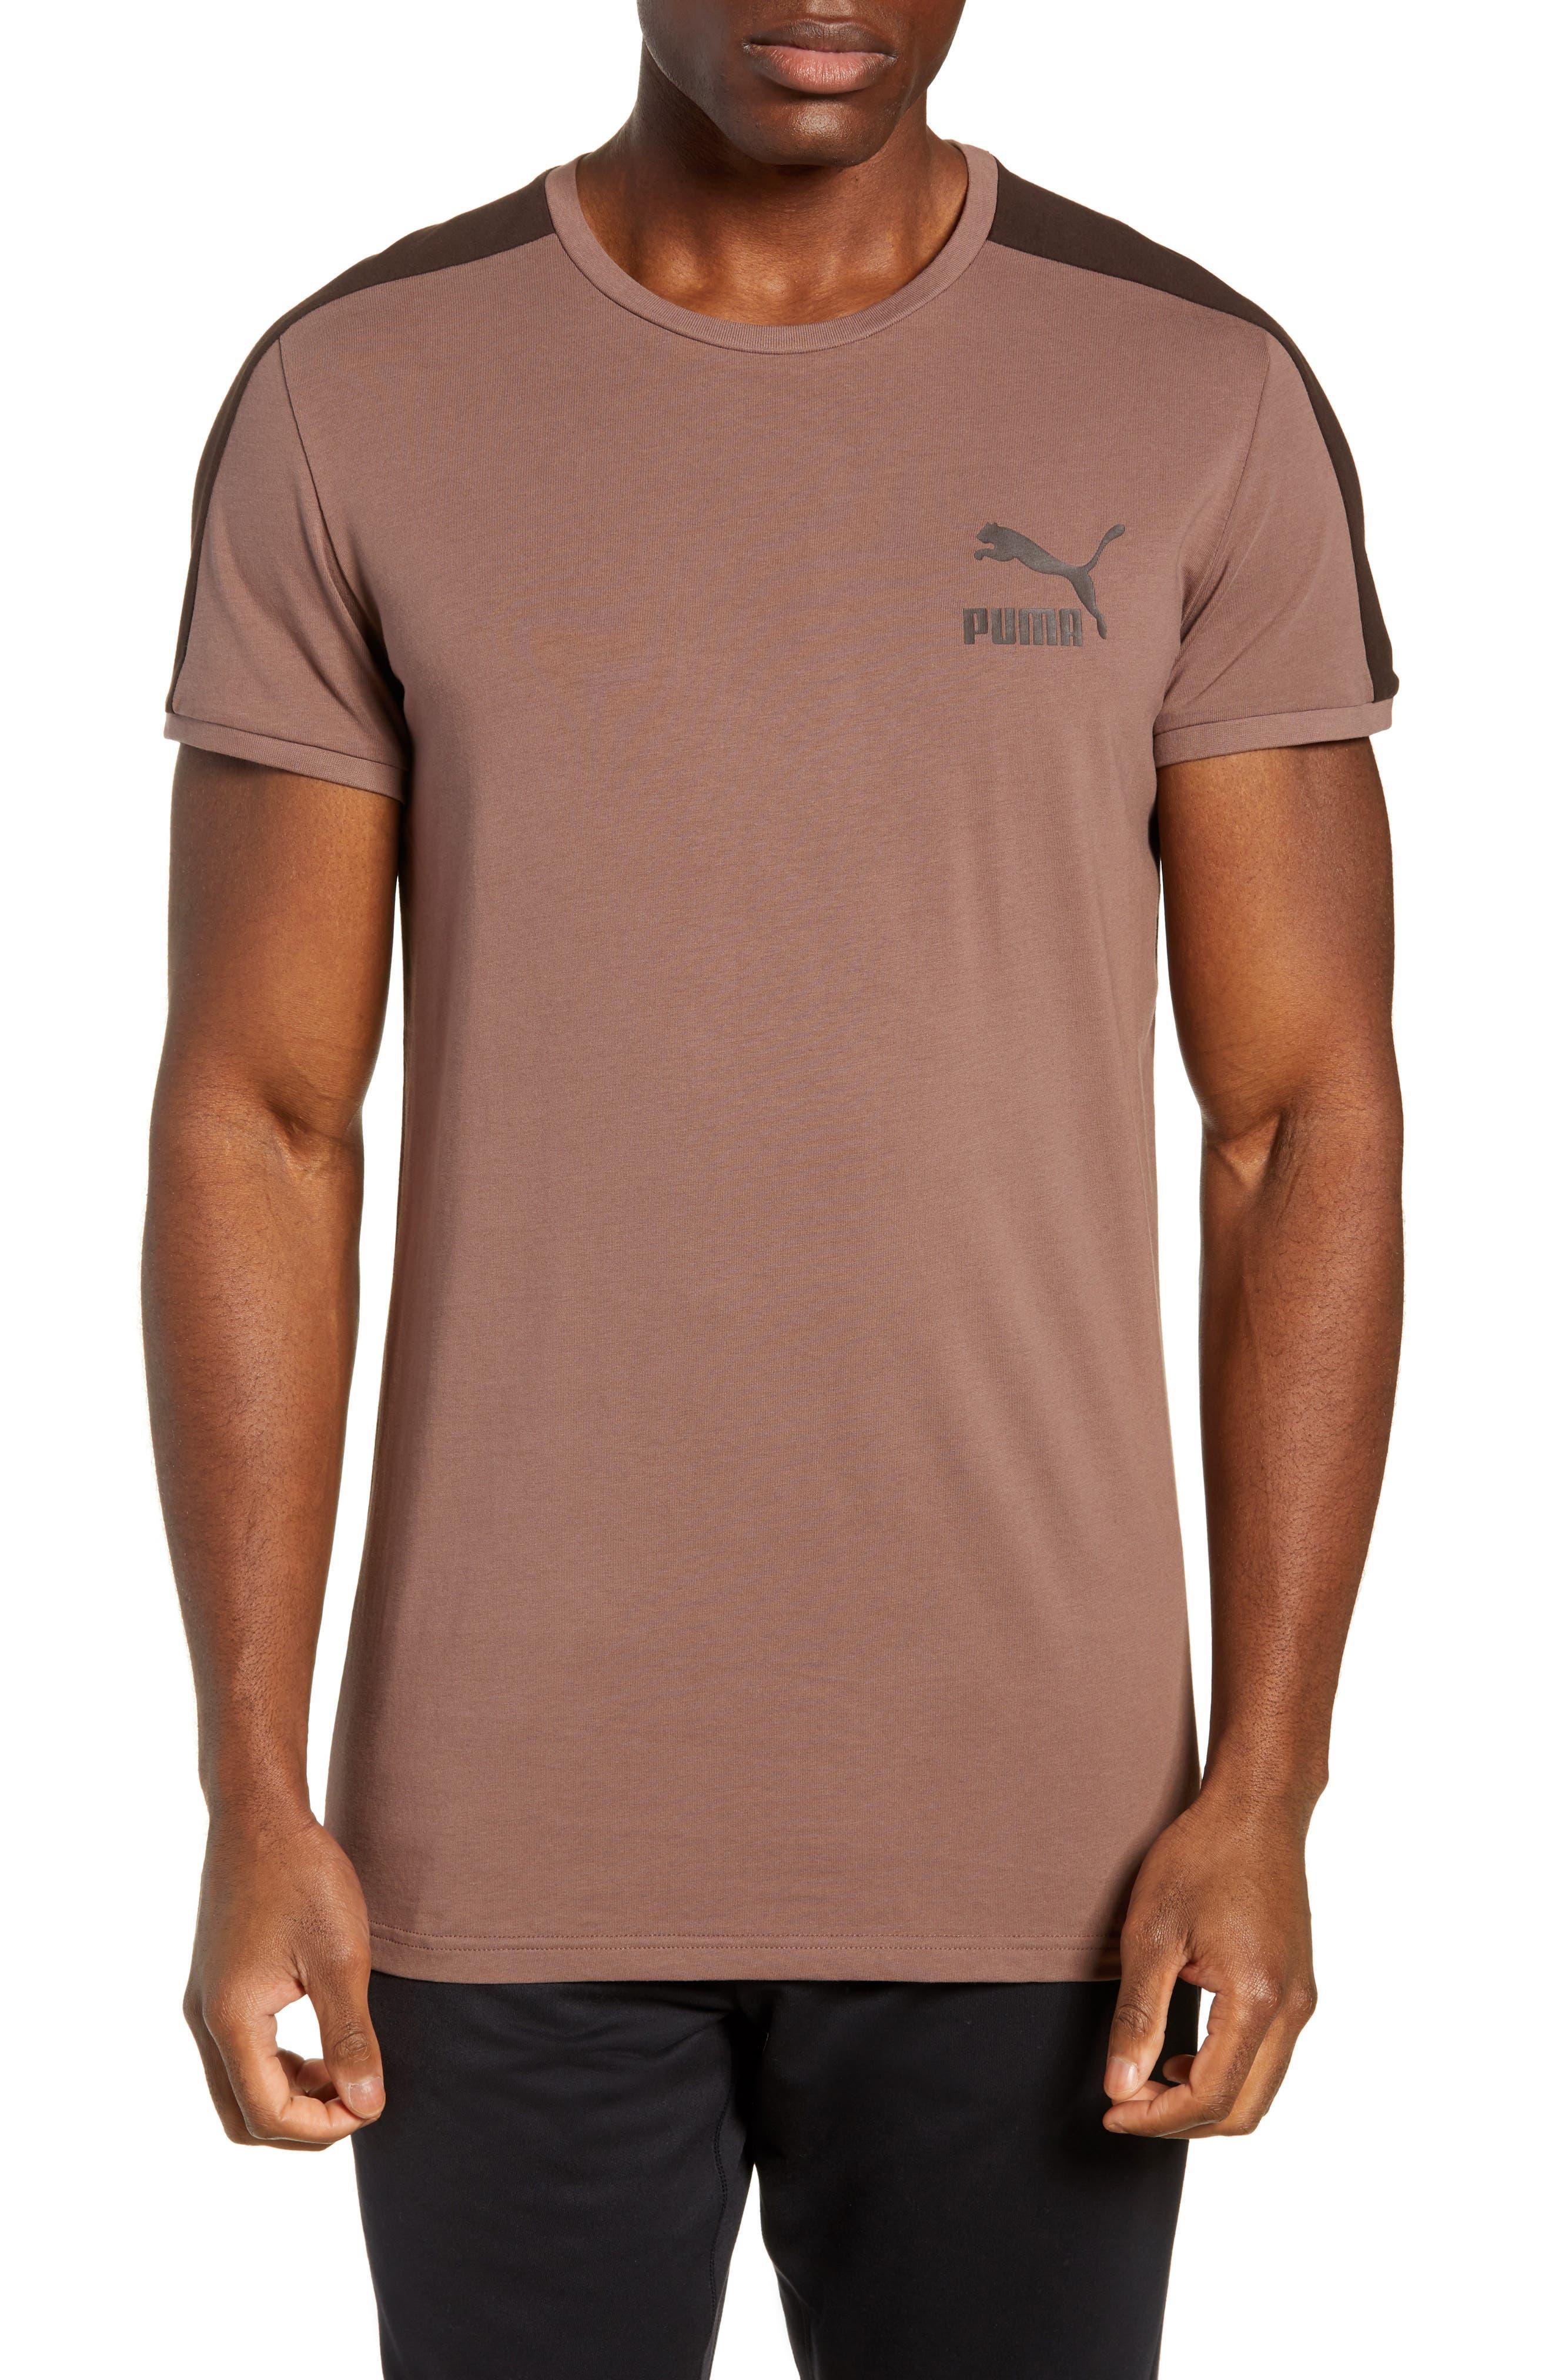 Classics Slim T7 T-Shirt,                             Main thumbnail 1, color,                             MEDIUM GRAY HEATHER